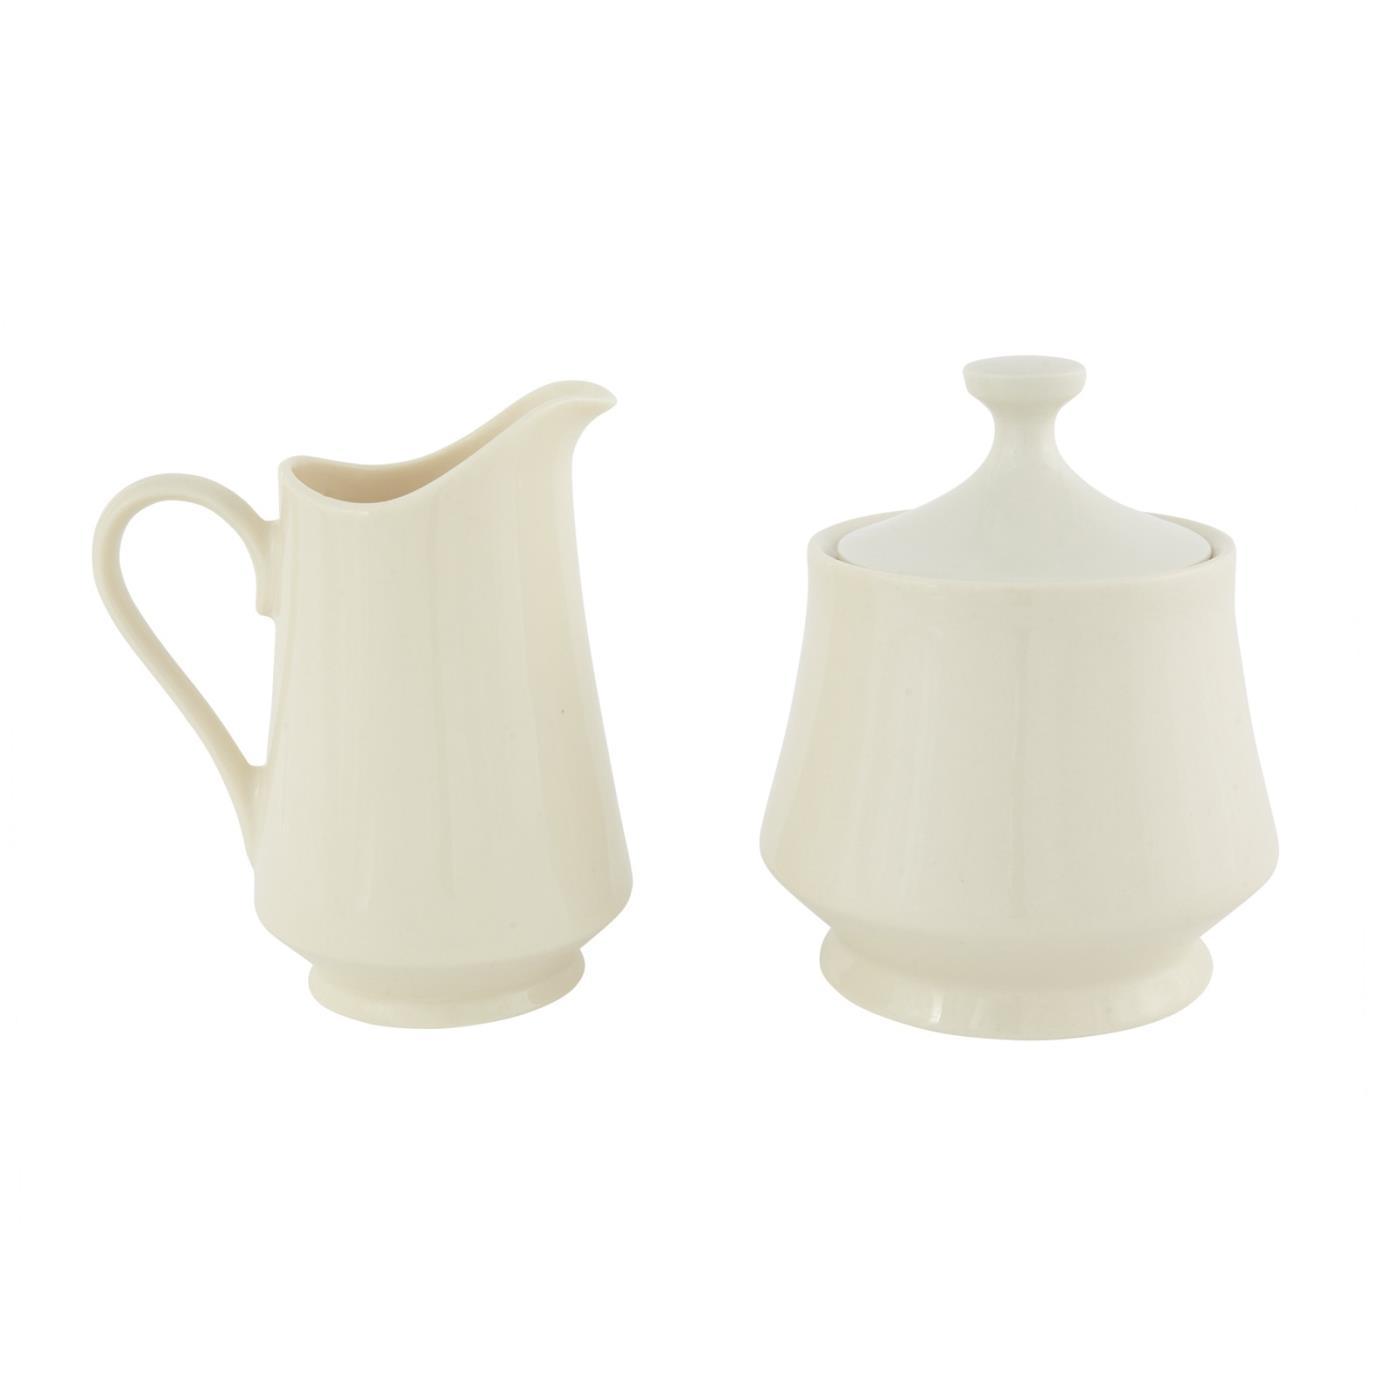 Sugar & Creamer Set - Ivory